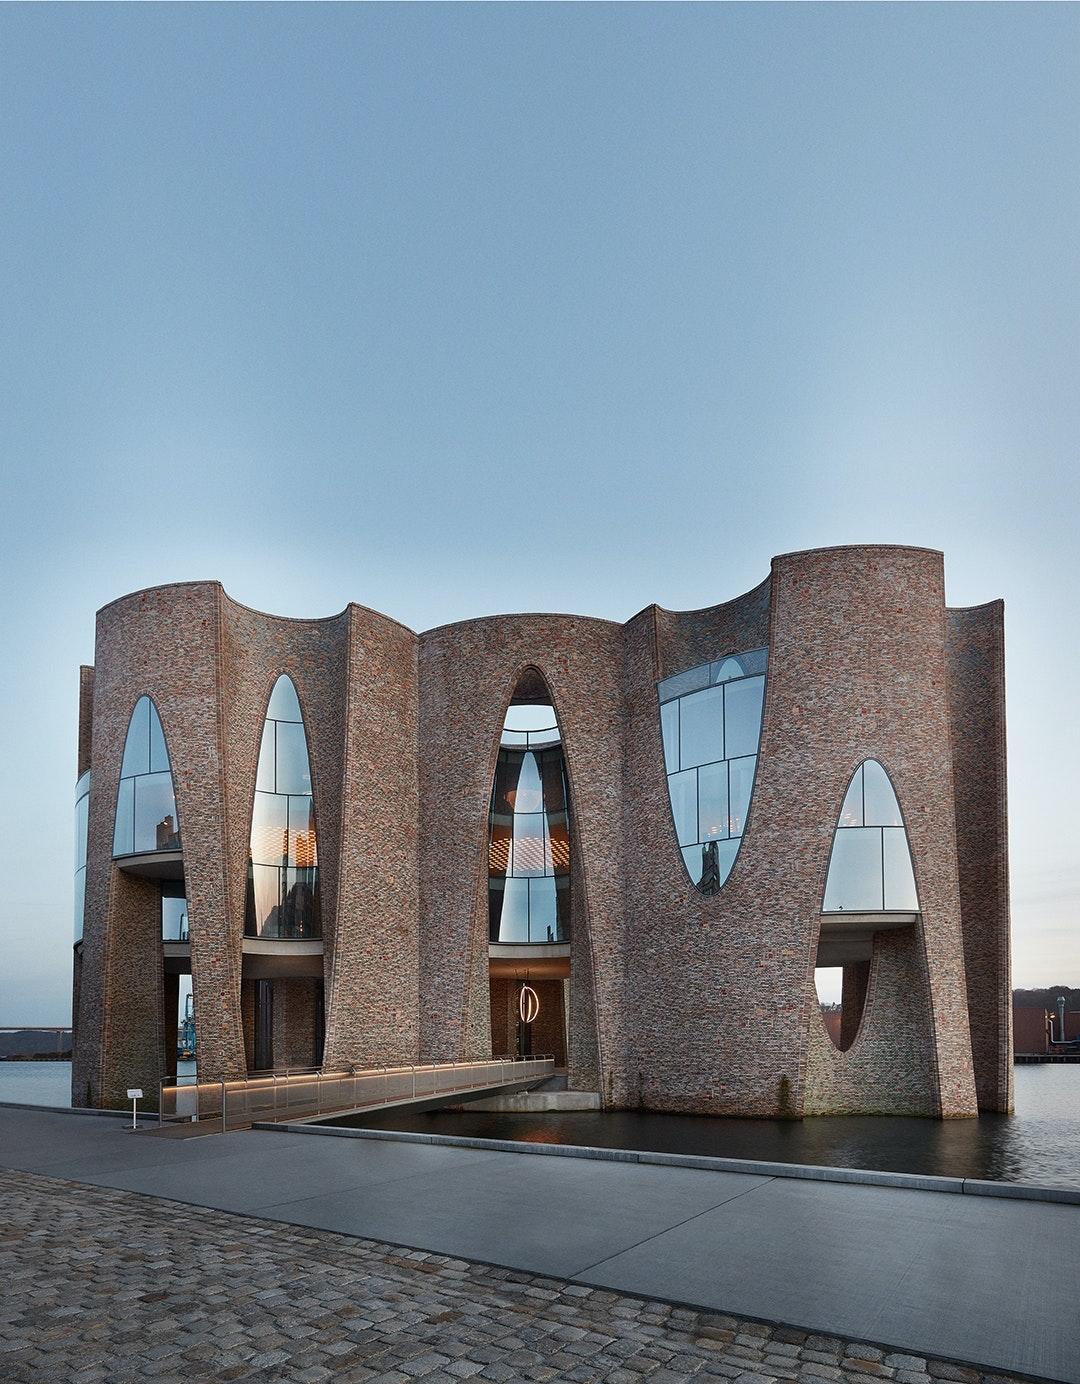 Fjordenhus Vejle Olafur Elliasson ikonisk byggeri